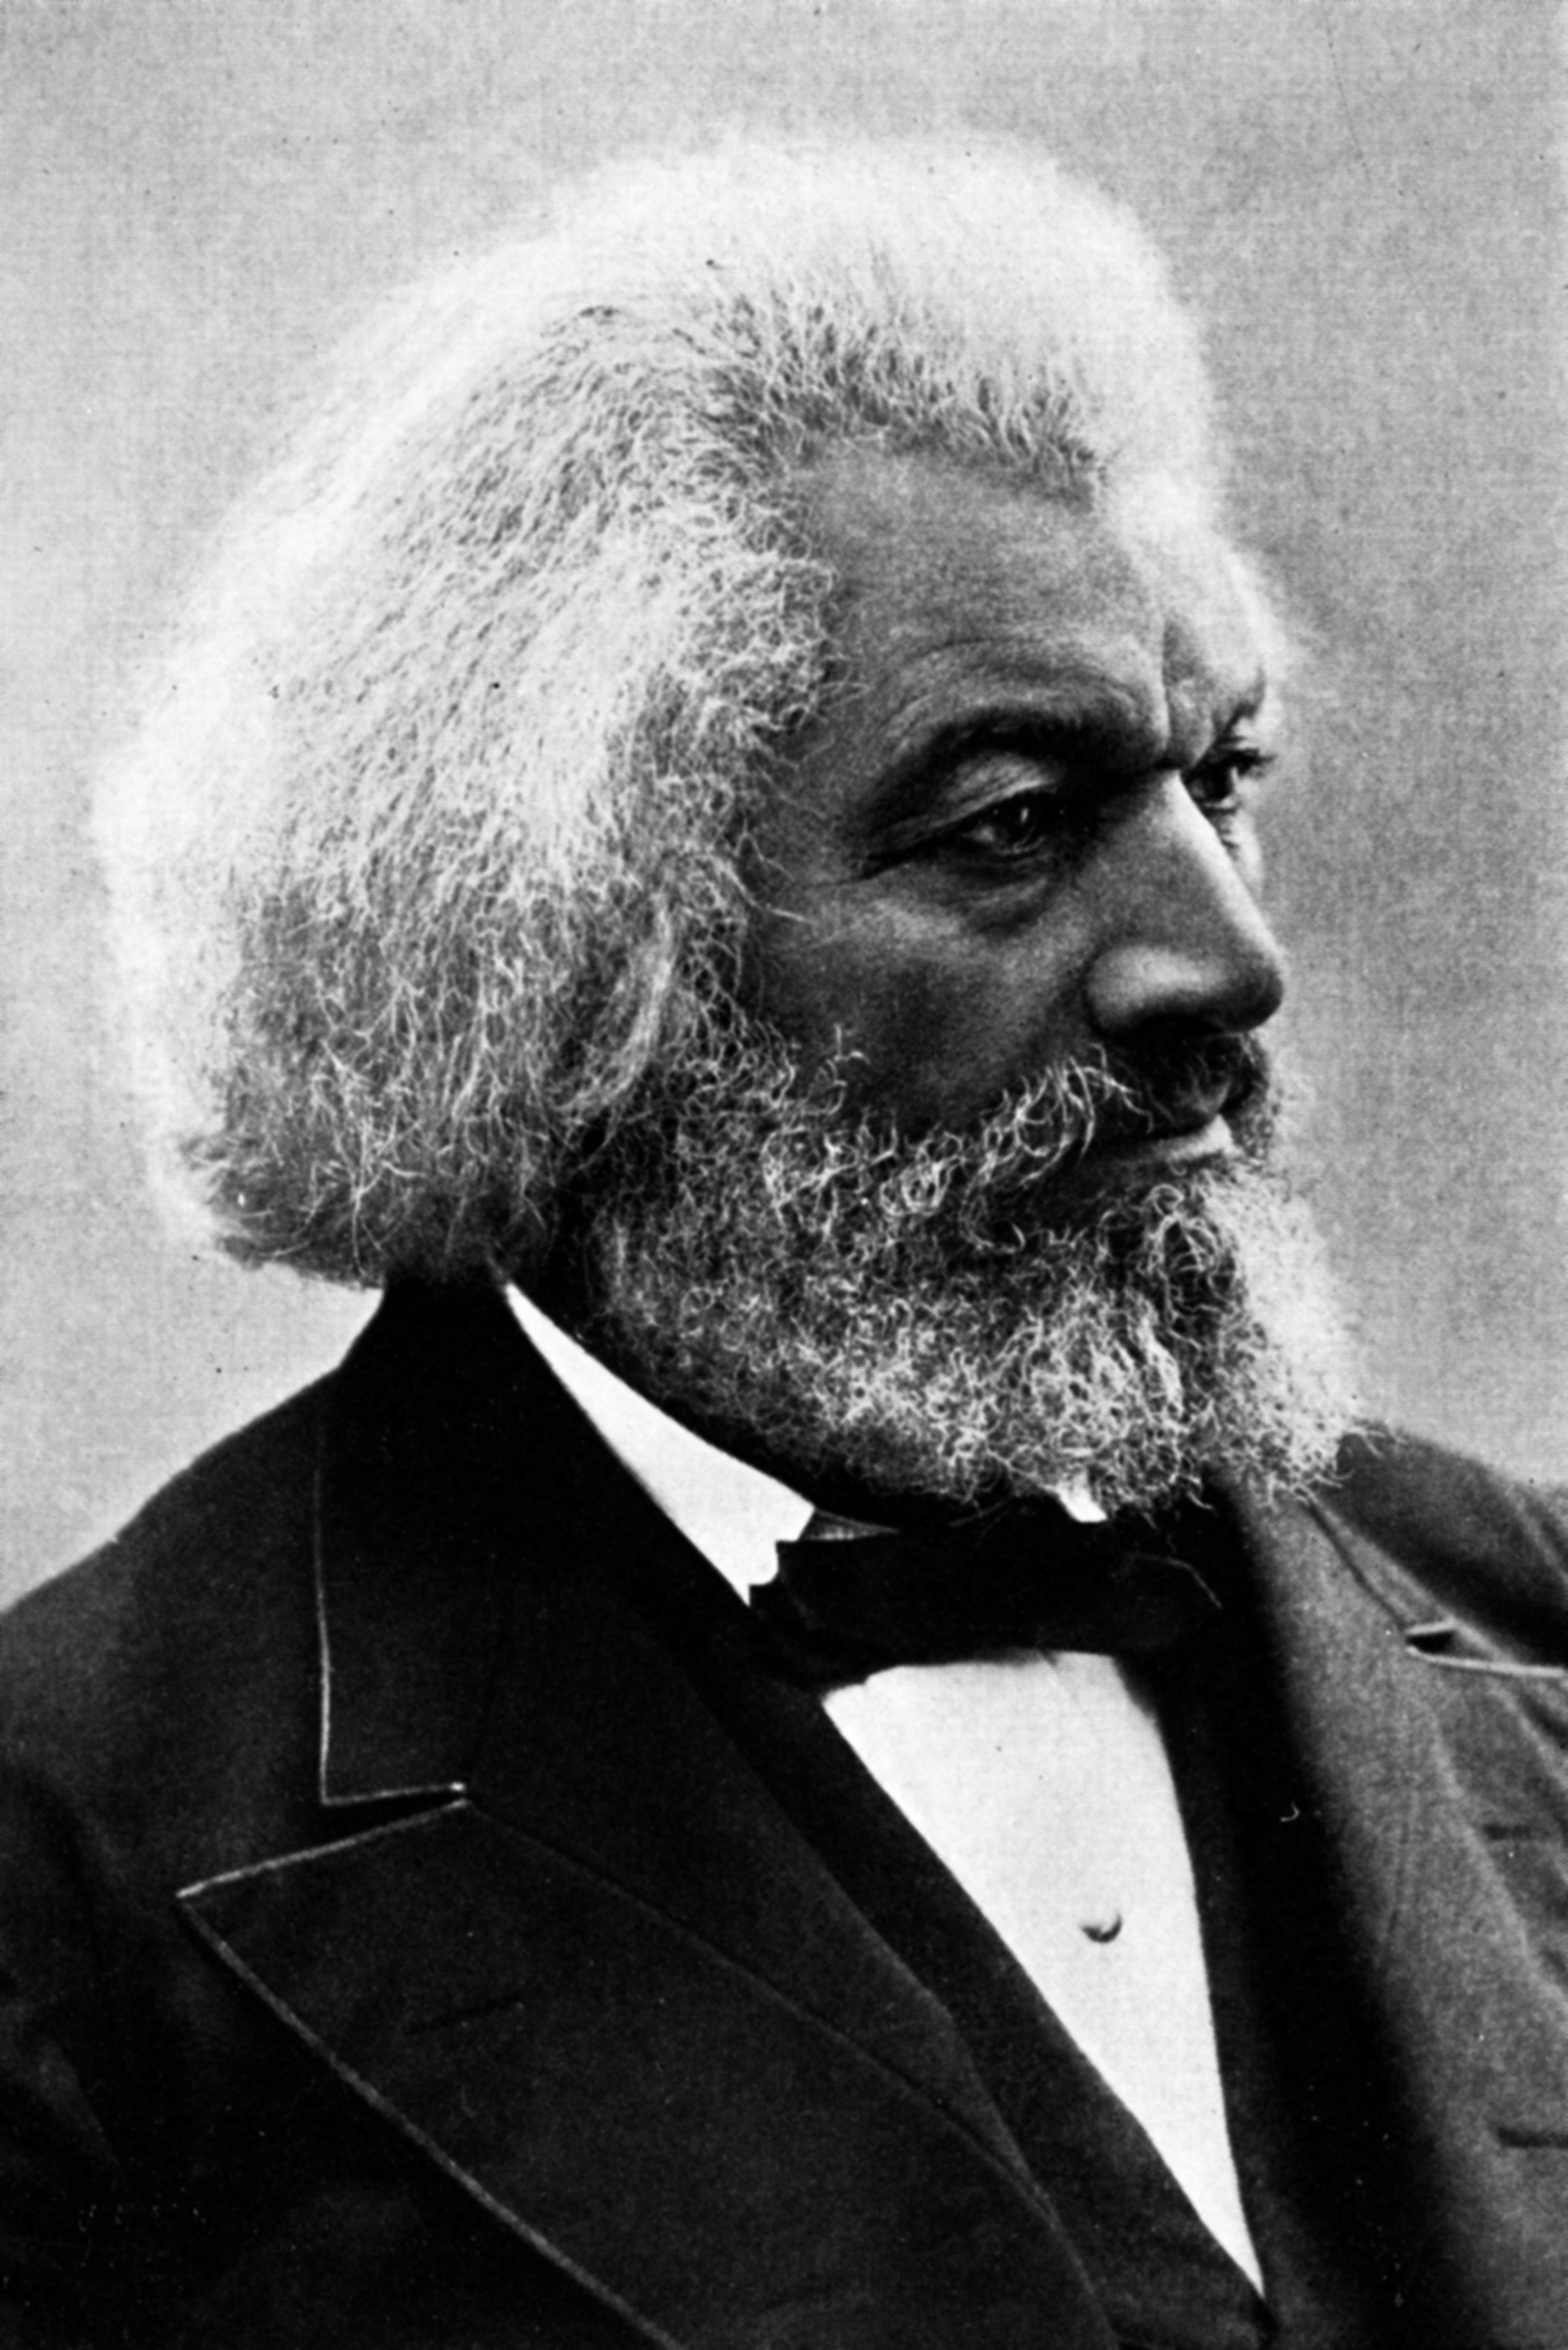 Frederick Douglass portrait